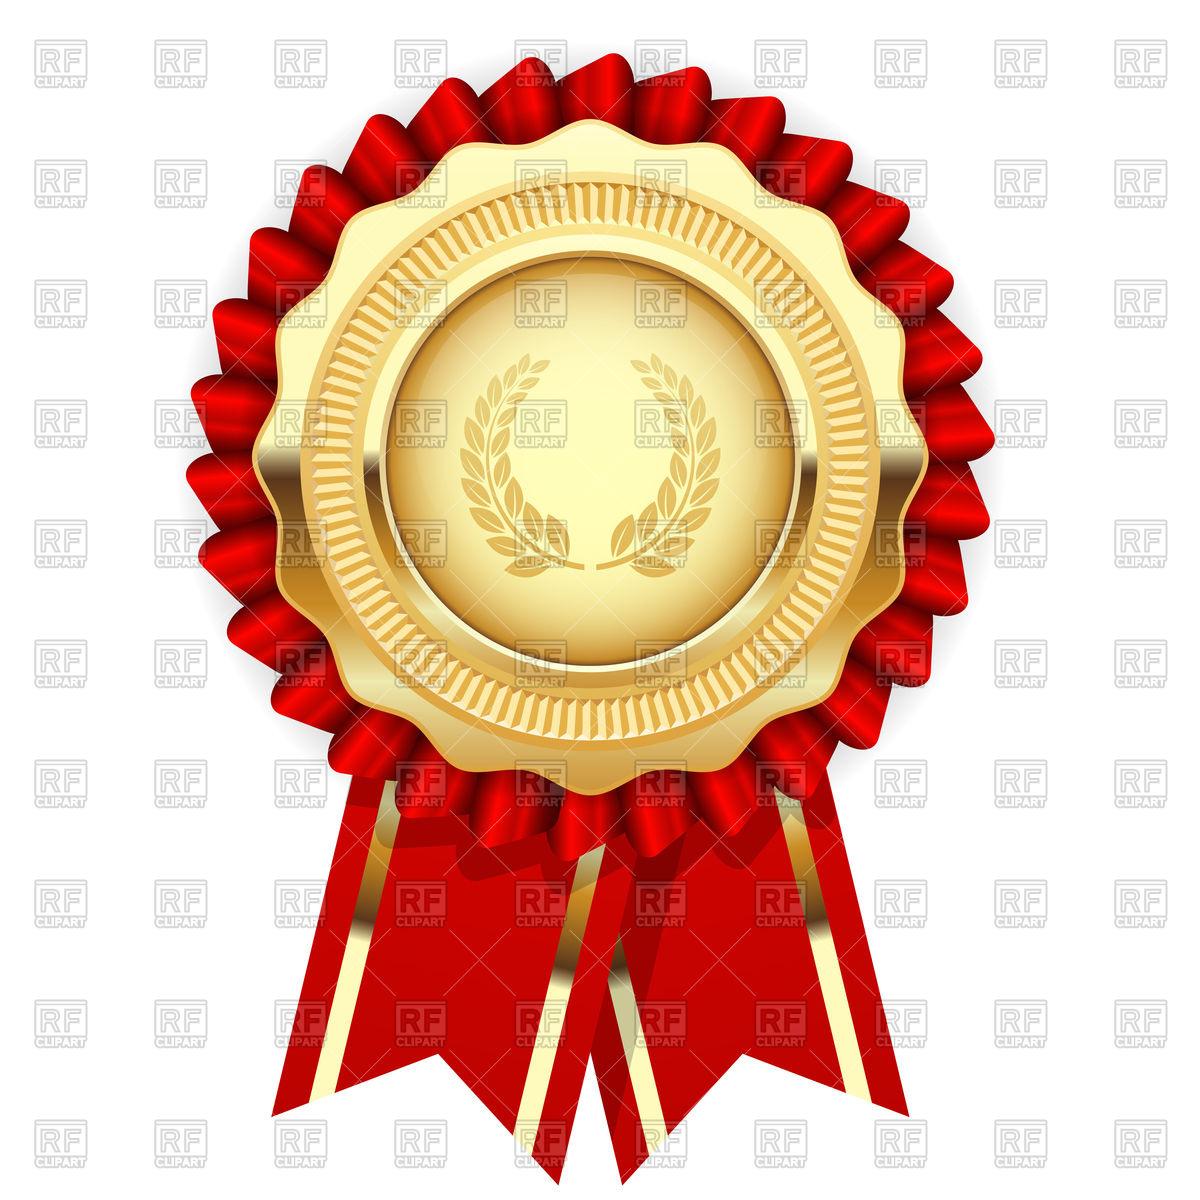 Blank award template.